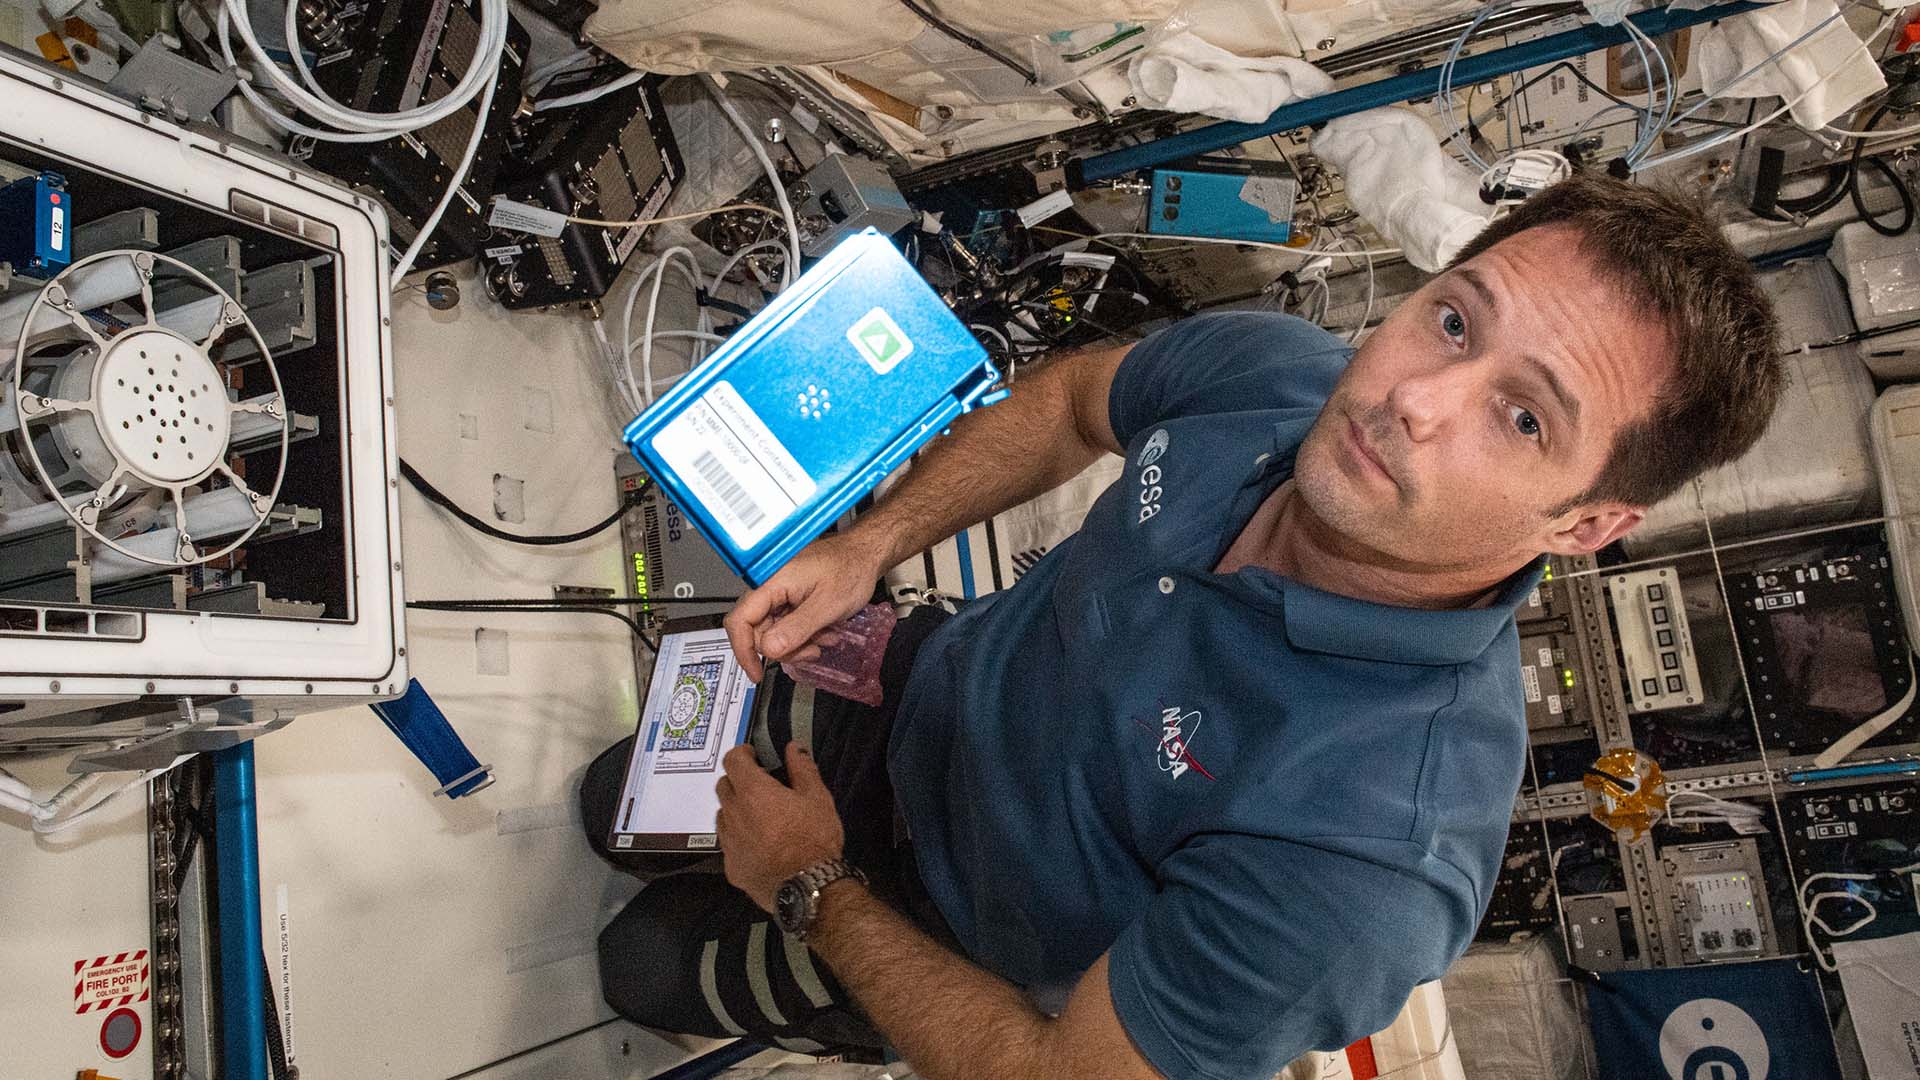 Quel sera le rôle de Thomas Pesquet en tant que « commandant de l'ISS » ?